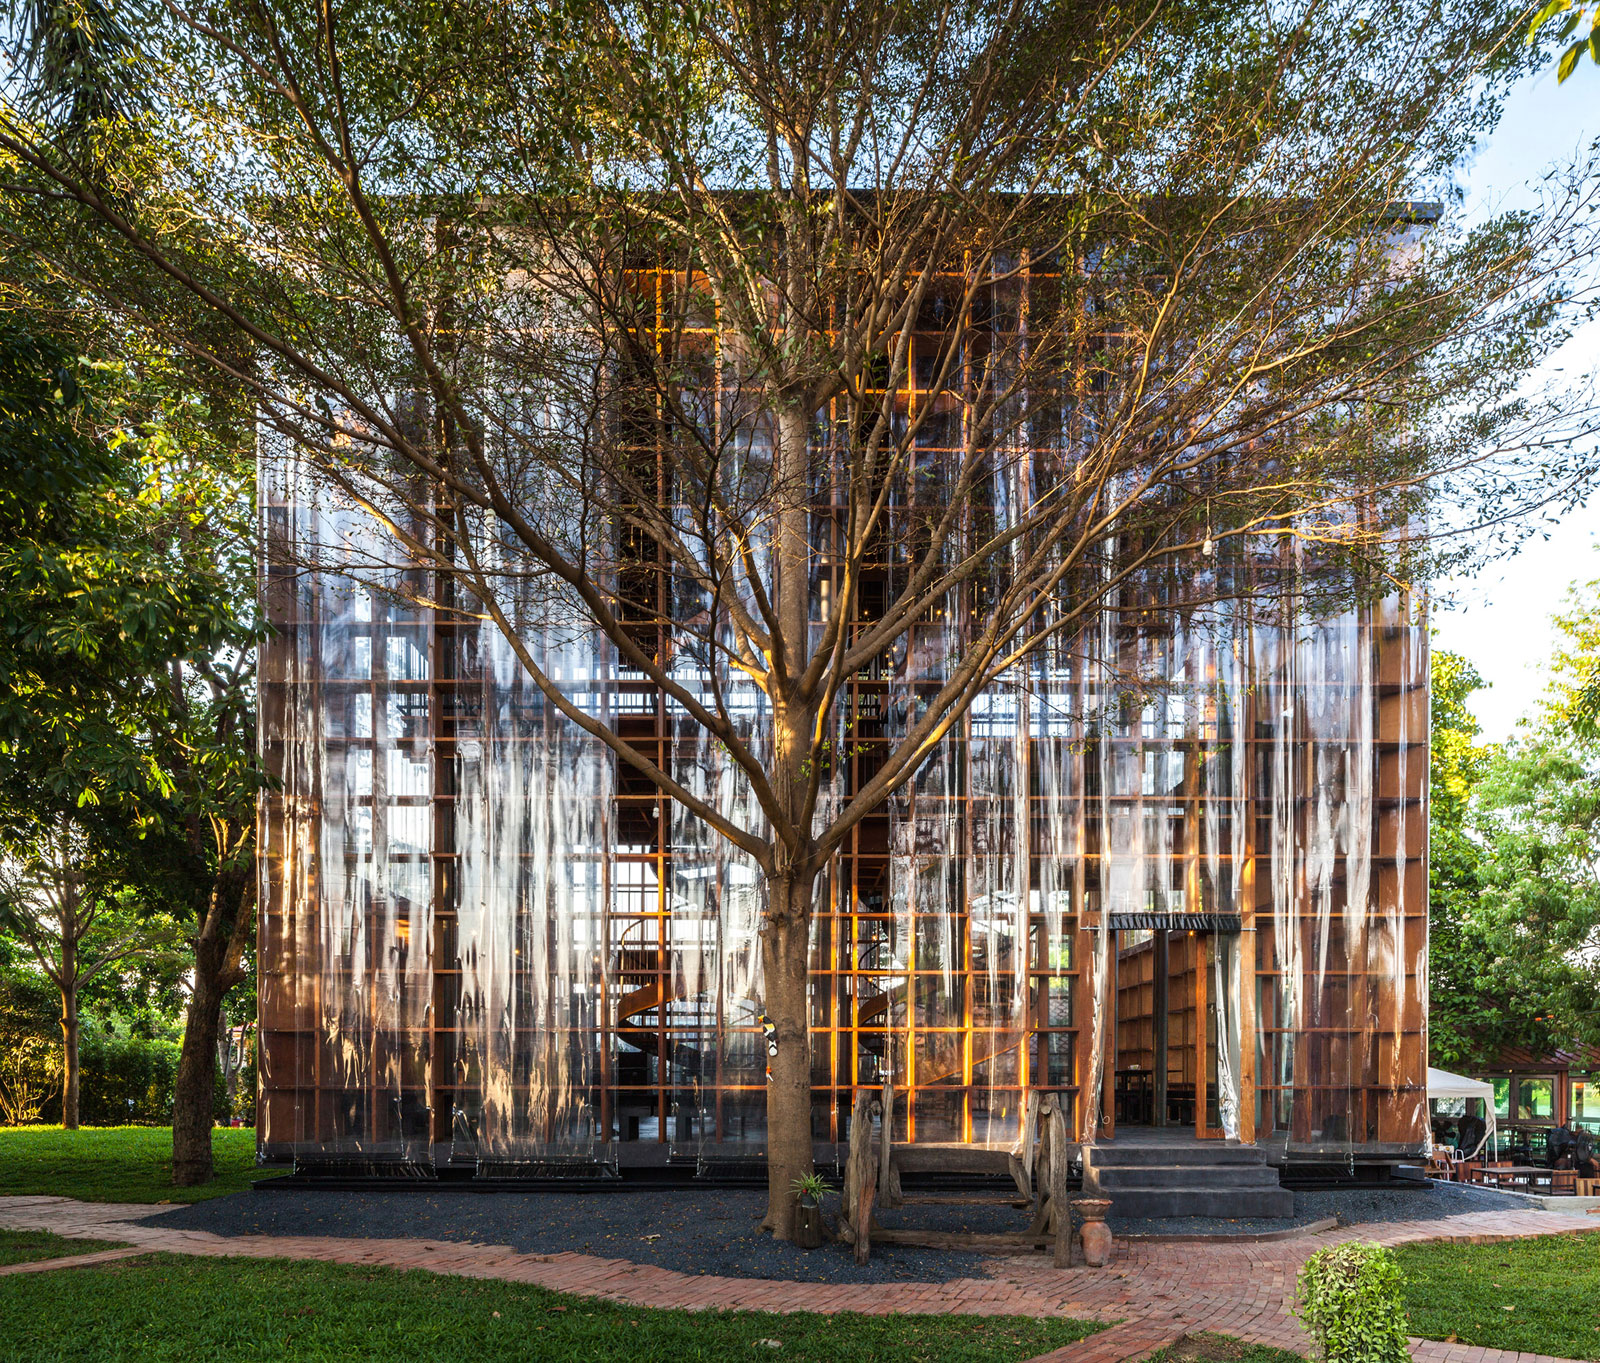 wine-bangkok-project-studio-architecture-public-leisure-thailand-_dezeen_2364_col_22